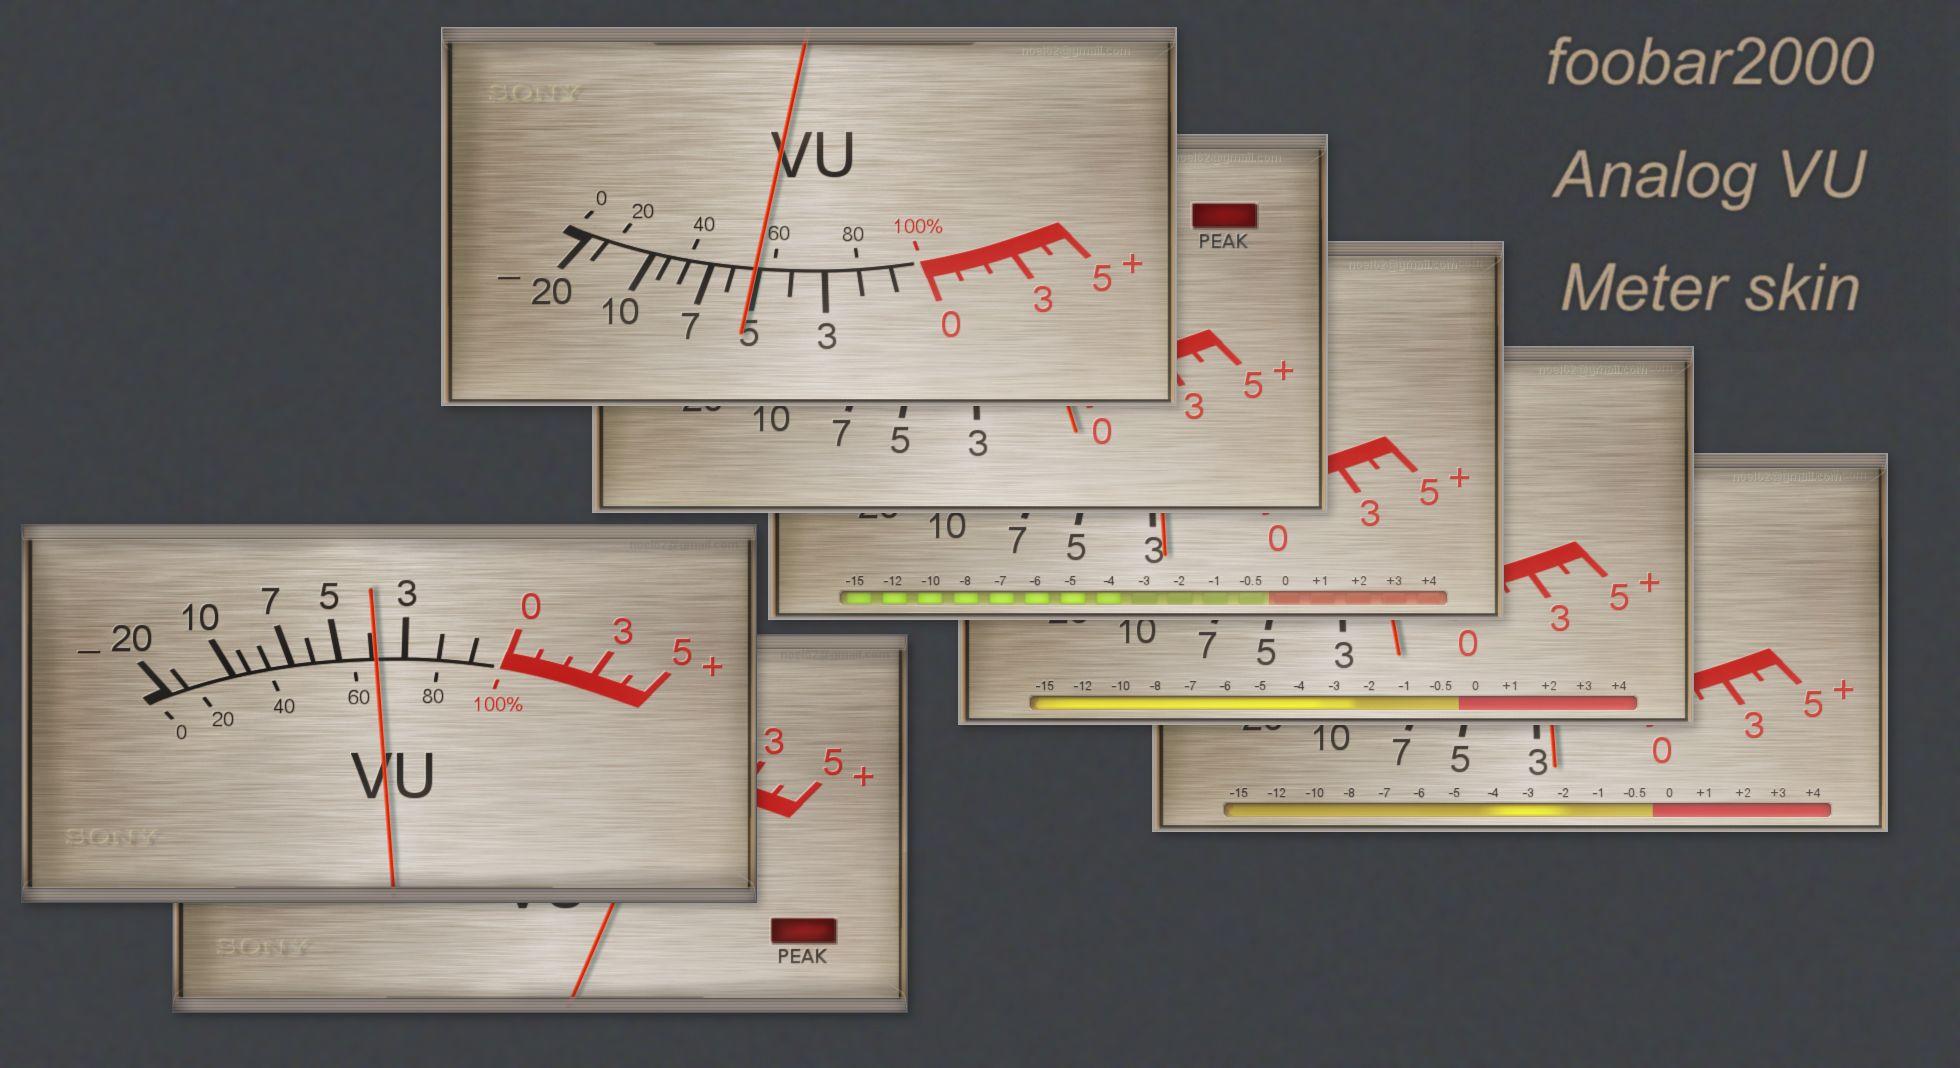 SONY TC-2xxx Analog VU Meter Plugin for foobar2000 by noel62